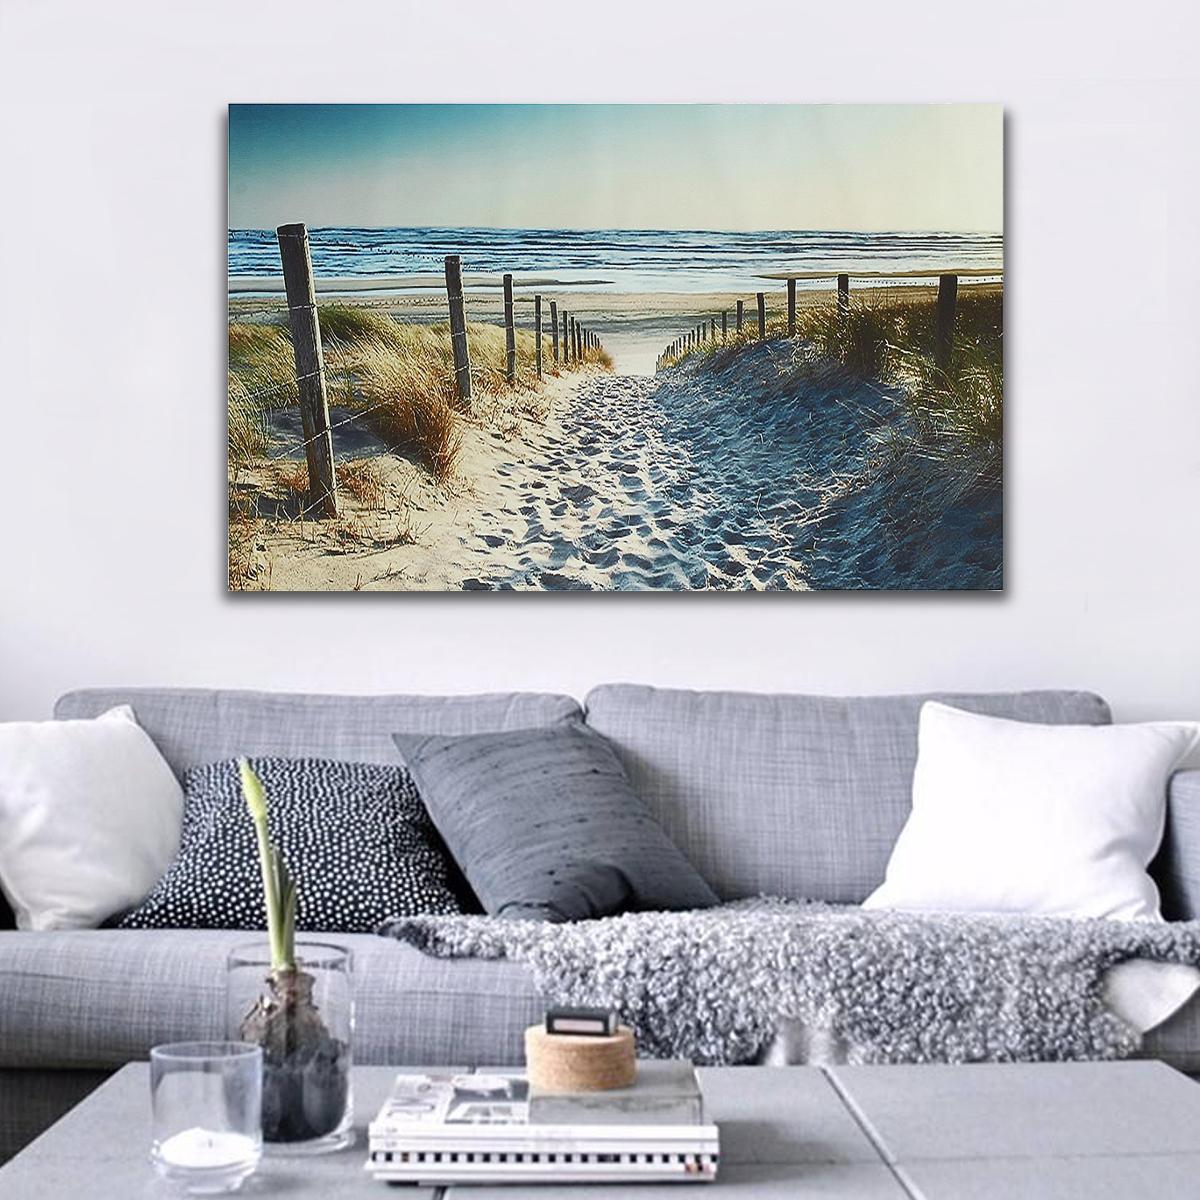 f42b326baa0 Ocean Beach Footprint Canvas Prints Paintings Wall Art Home Decor Unframed  COD